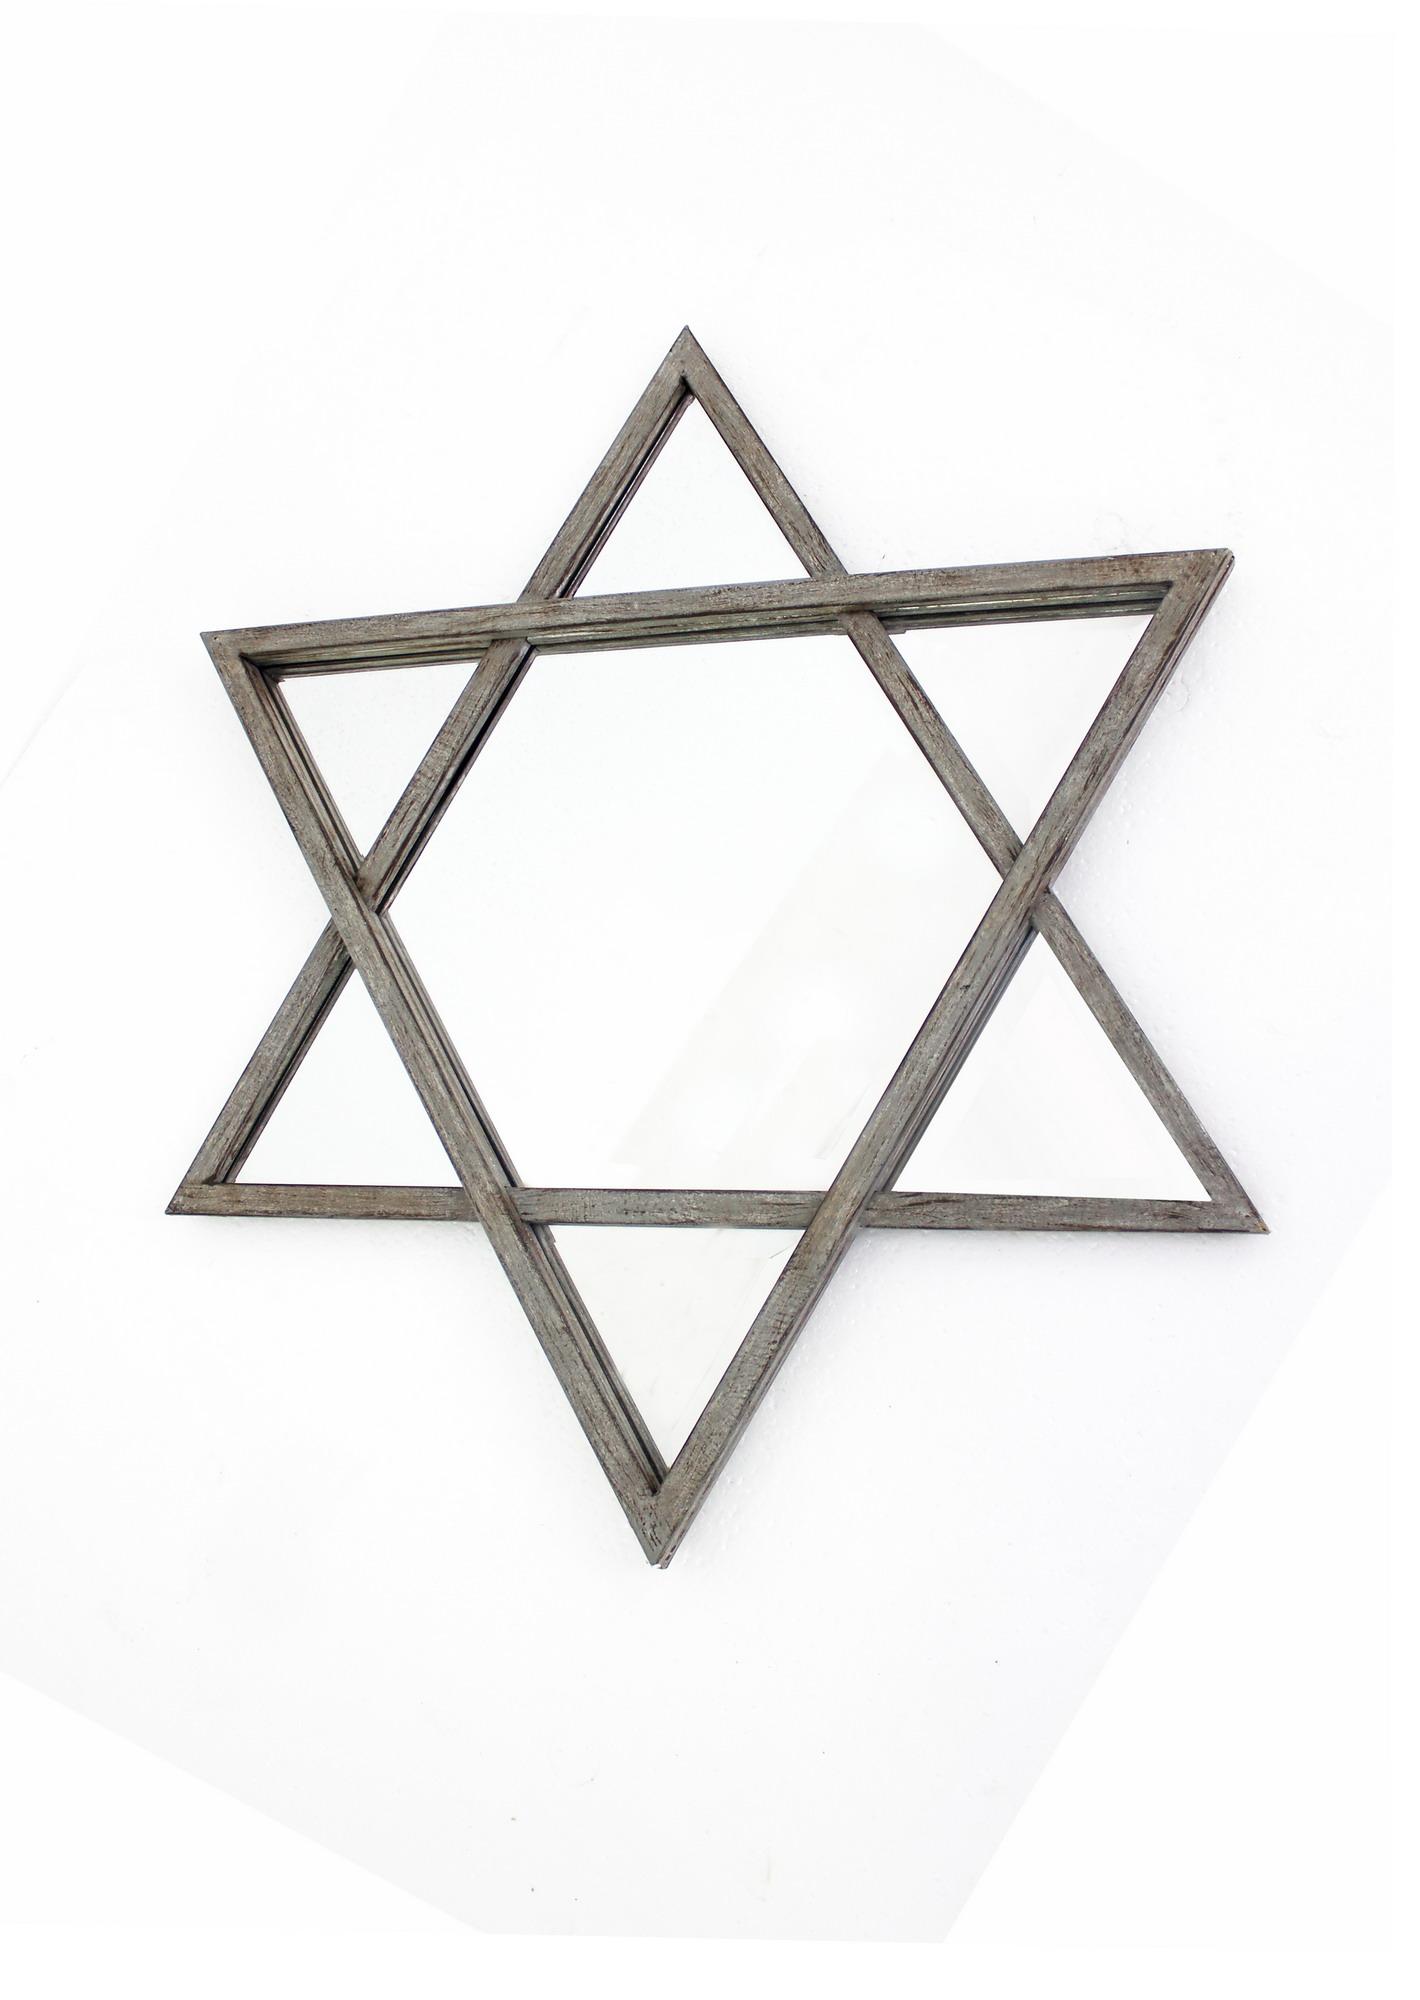 "26"" x 30"" x 2"" Silver, Rustic, Hexagram Wooden - Cosmetic Mirror"